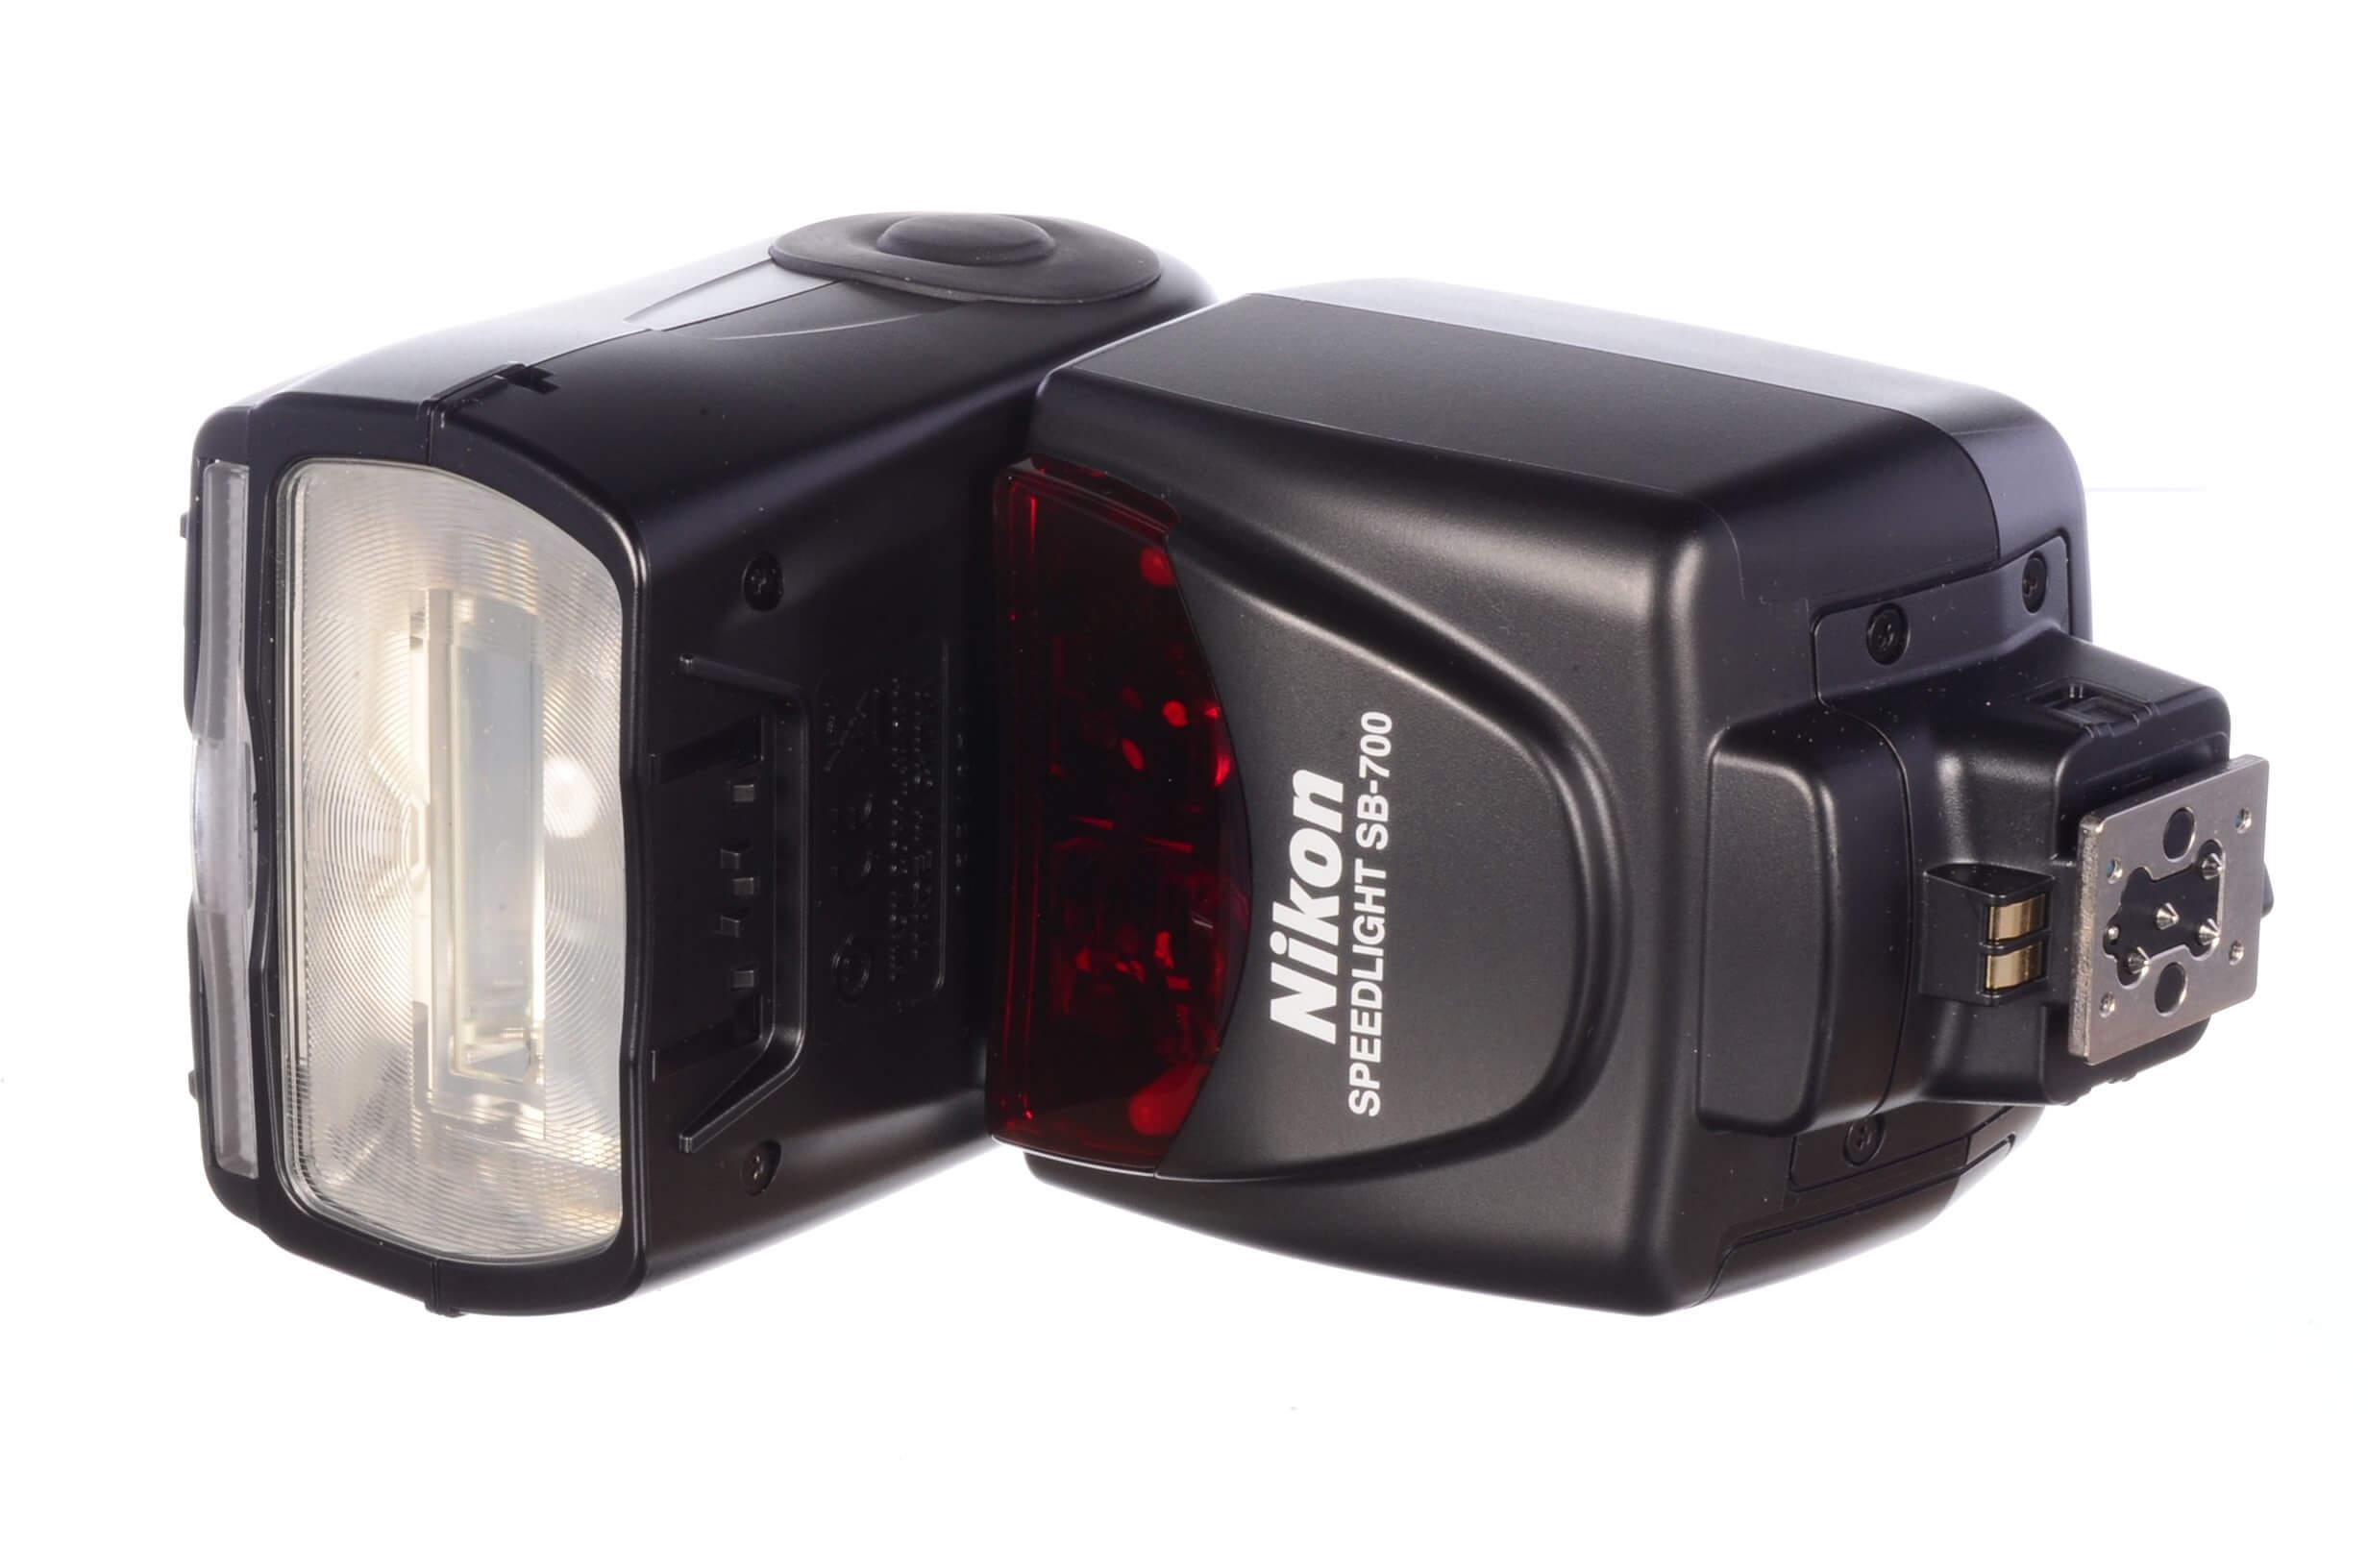 Nikon SB-700 Speedlight, MINT!